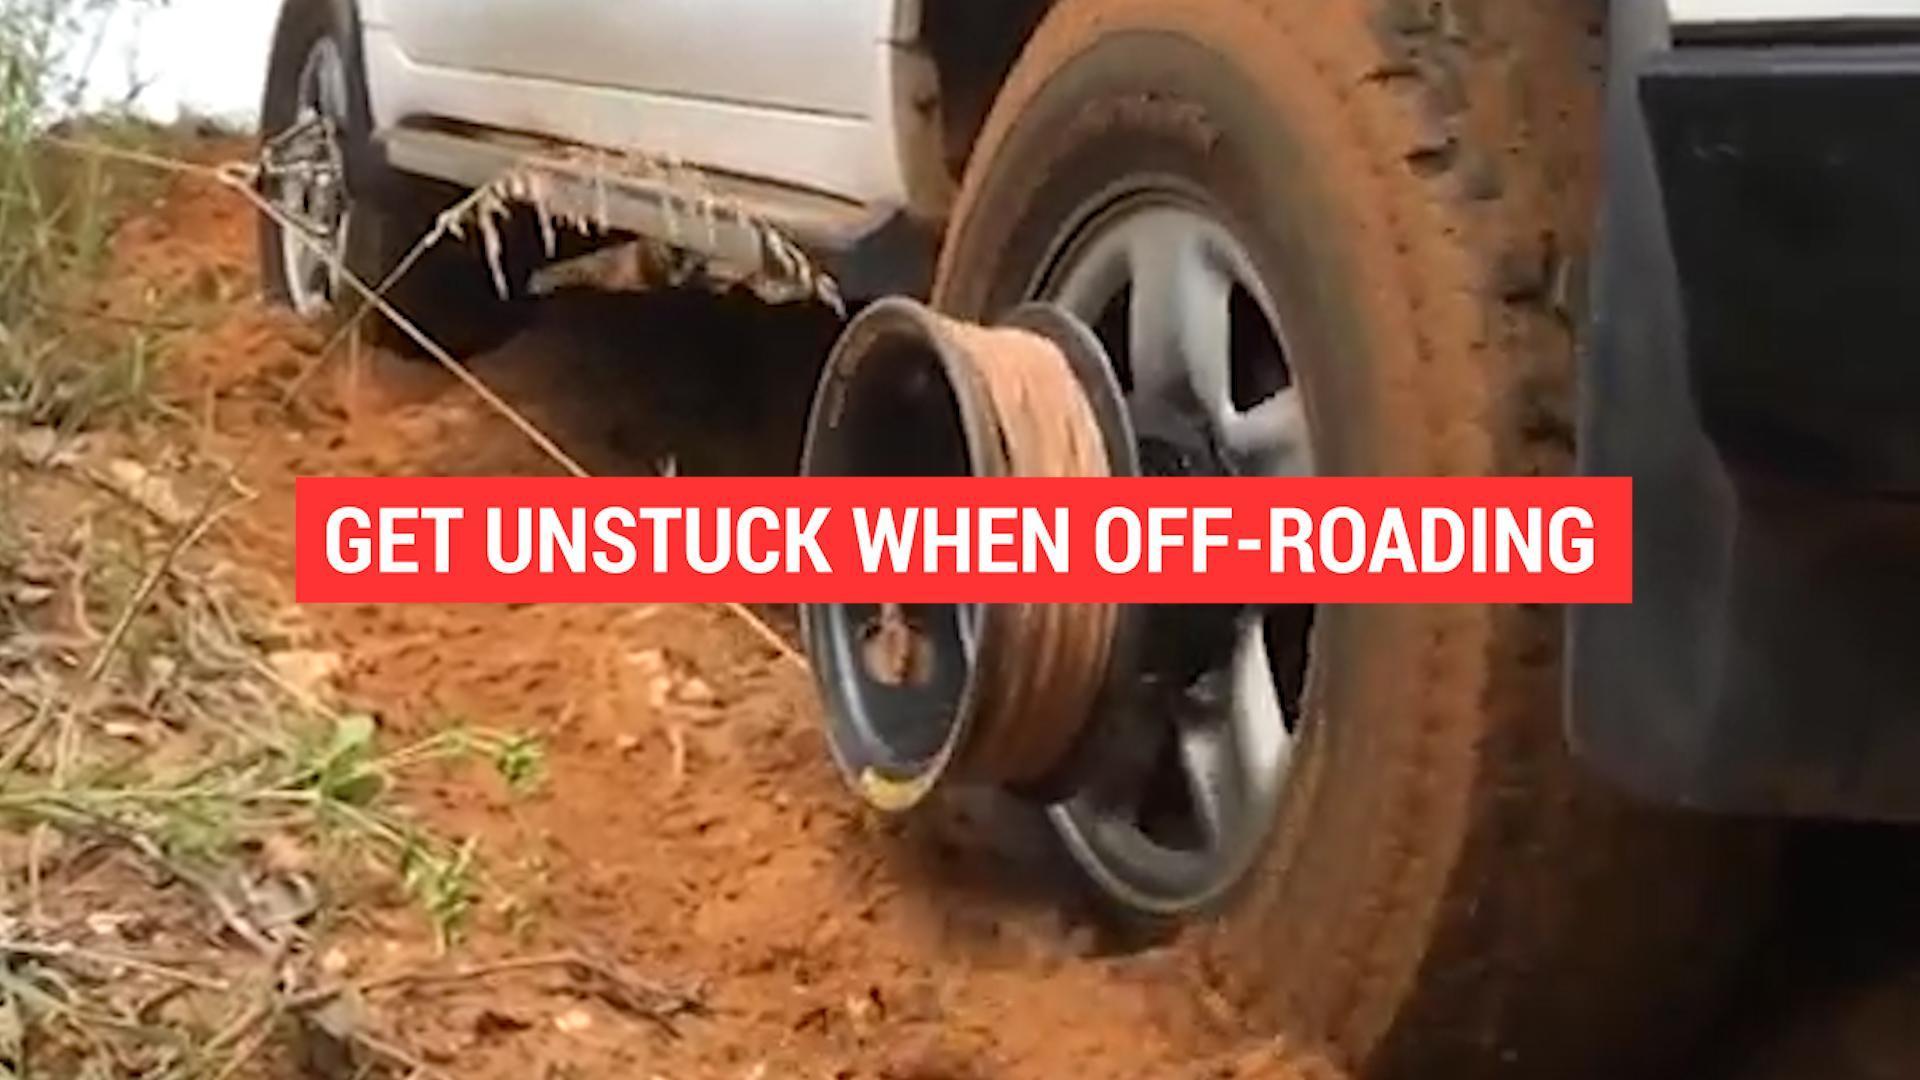 Never call a tow truck again - Autoblog